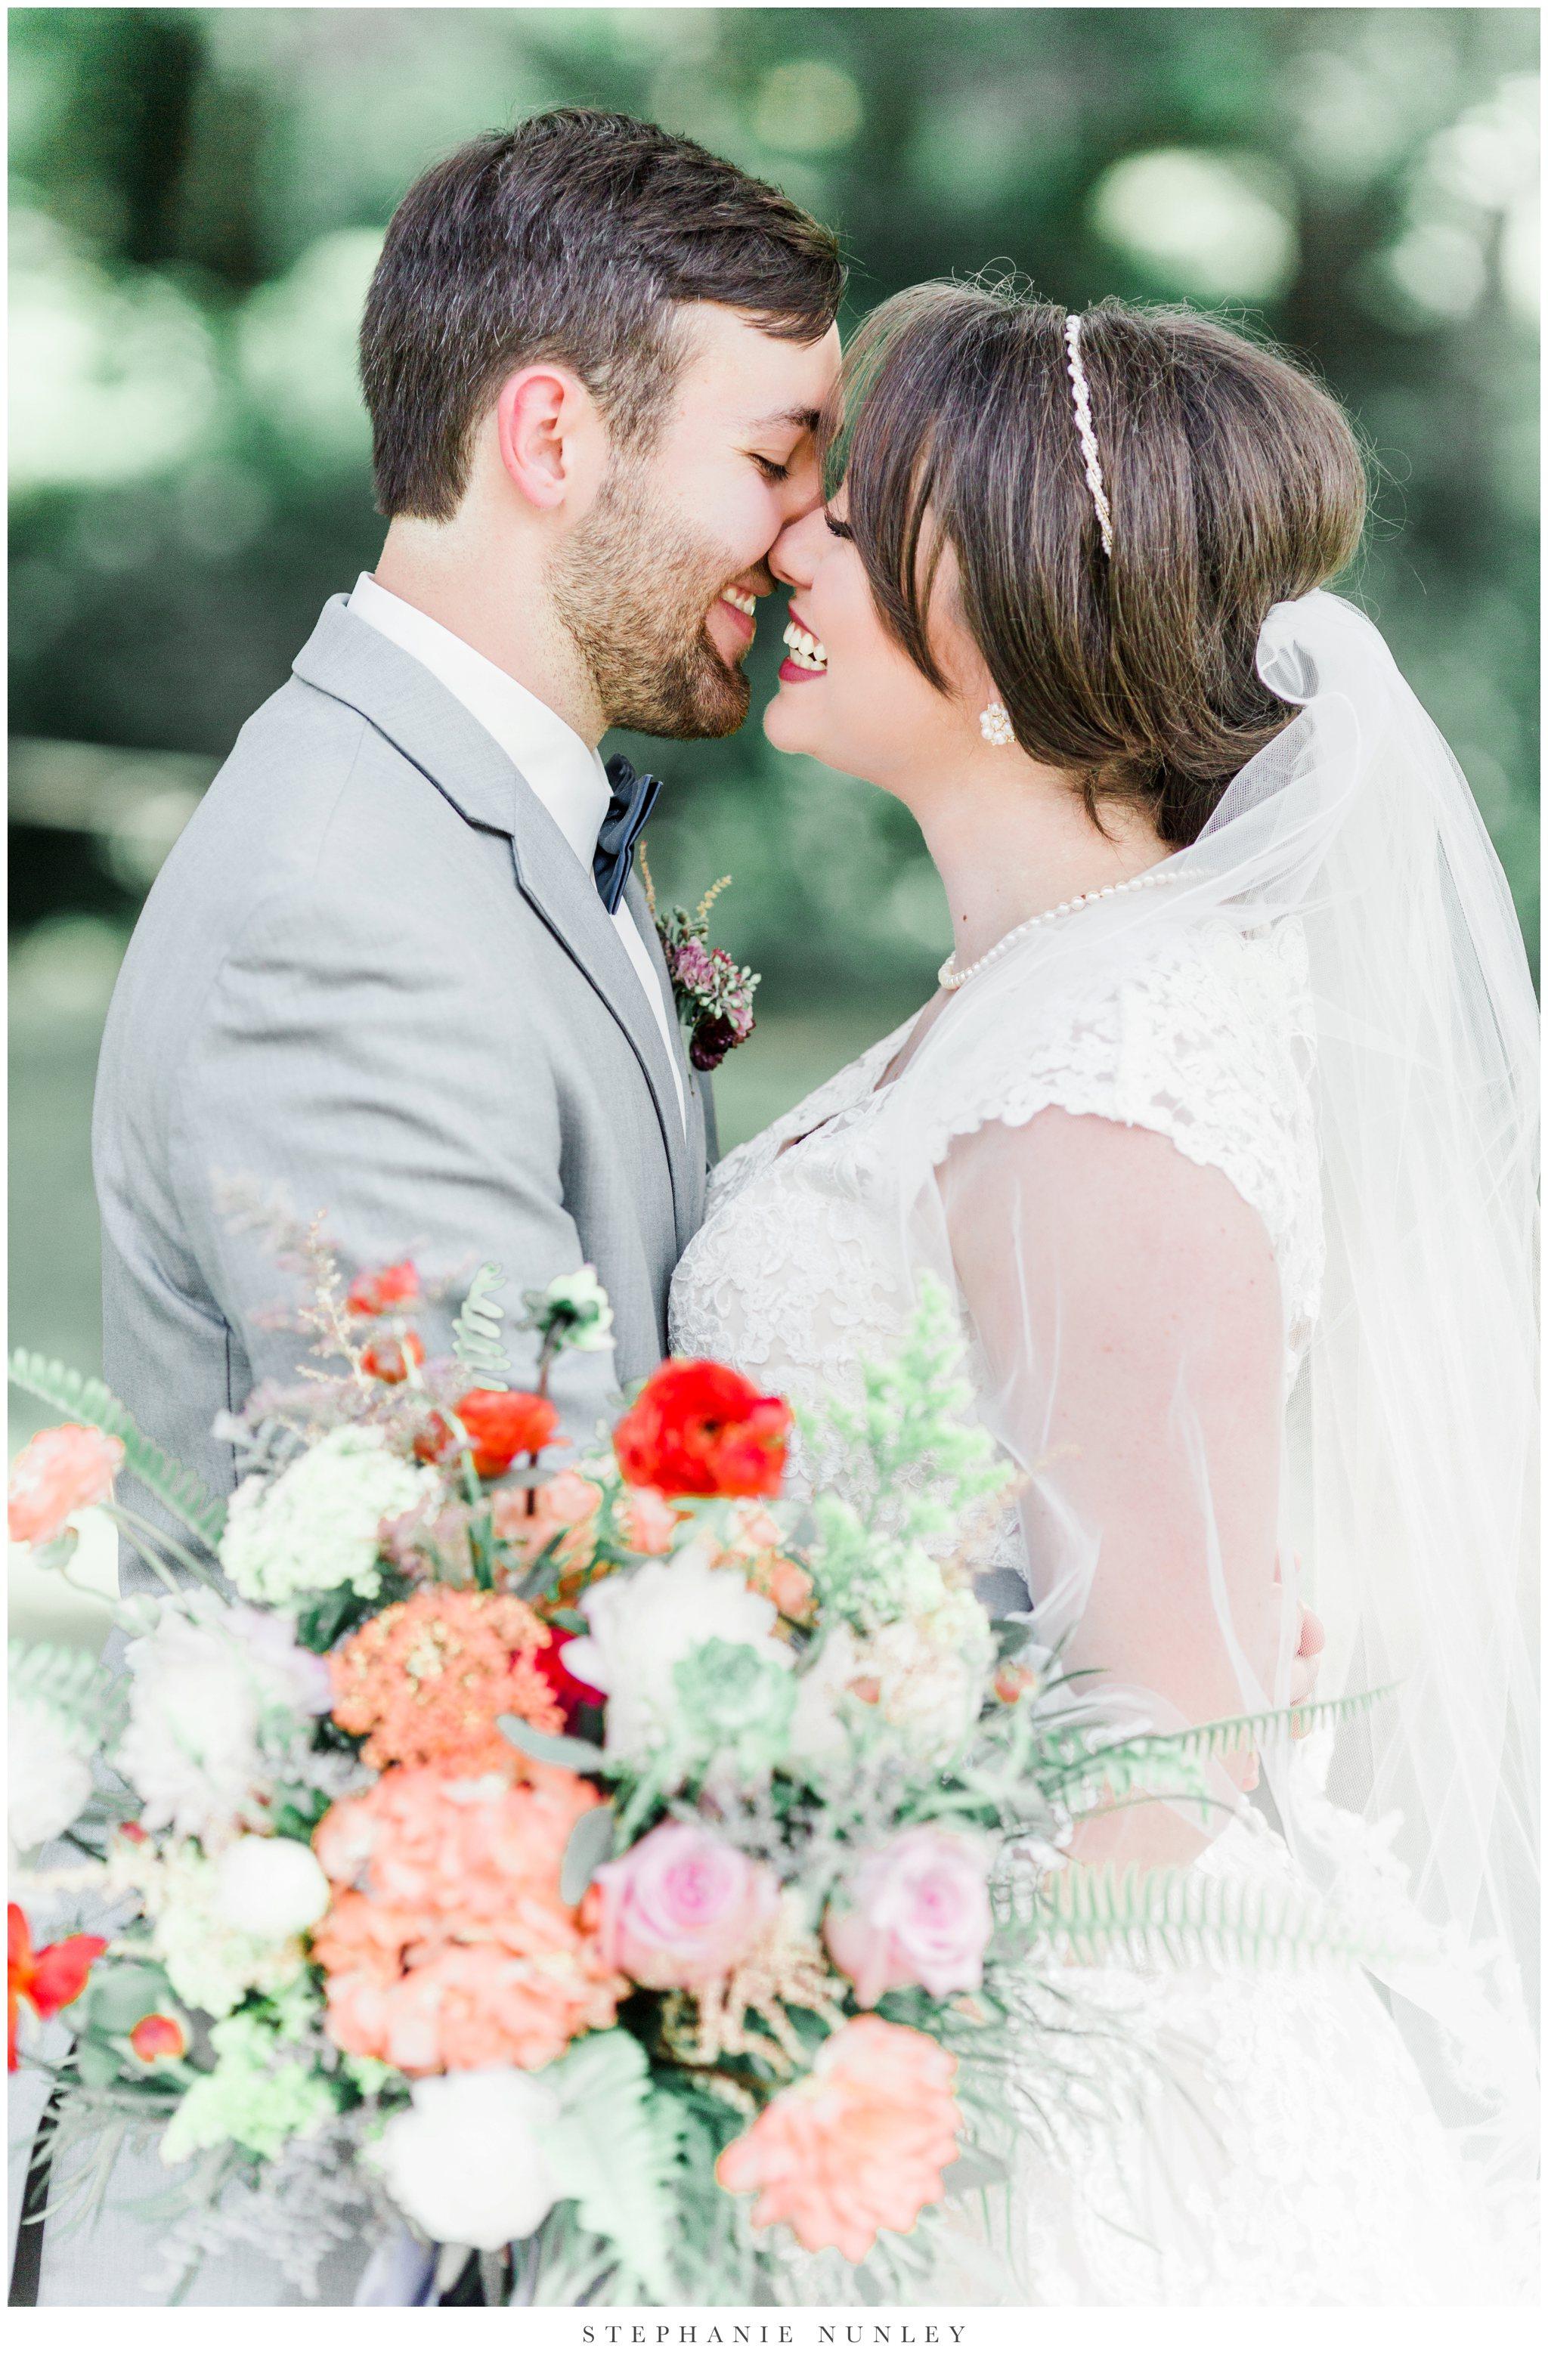 arkansas-wedding-with-lush-wildflower-bouquet-0053.jpg